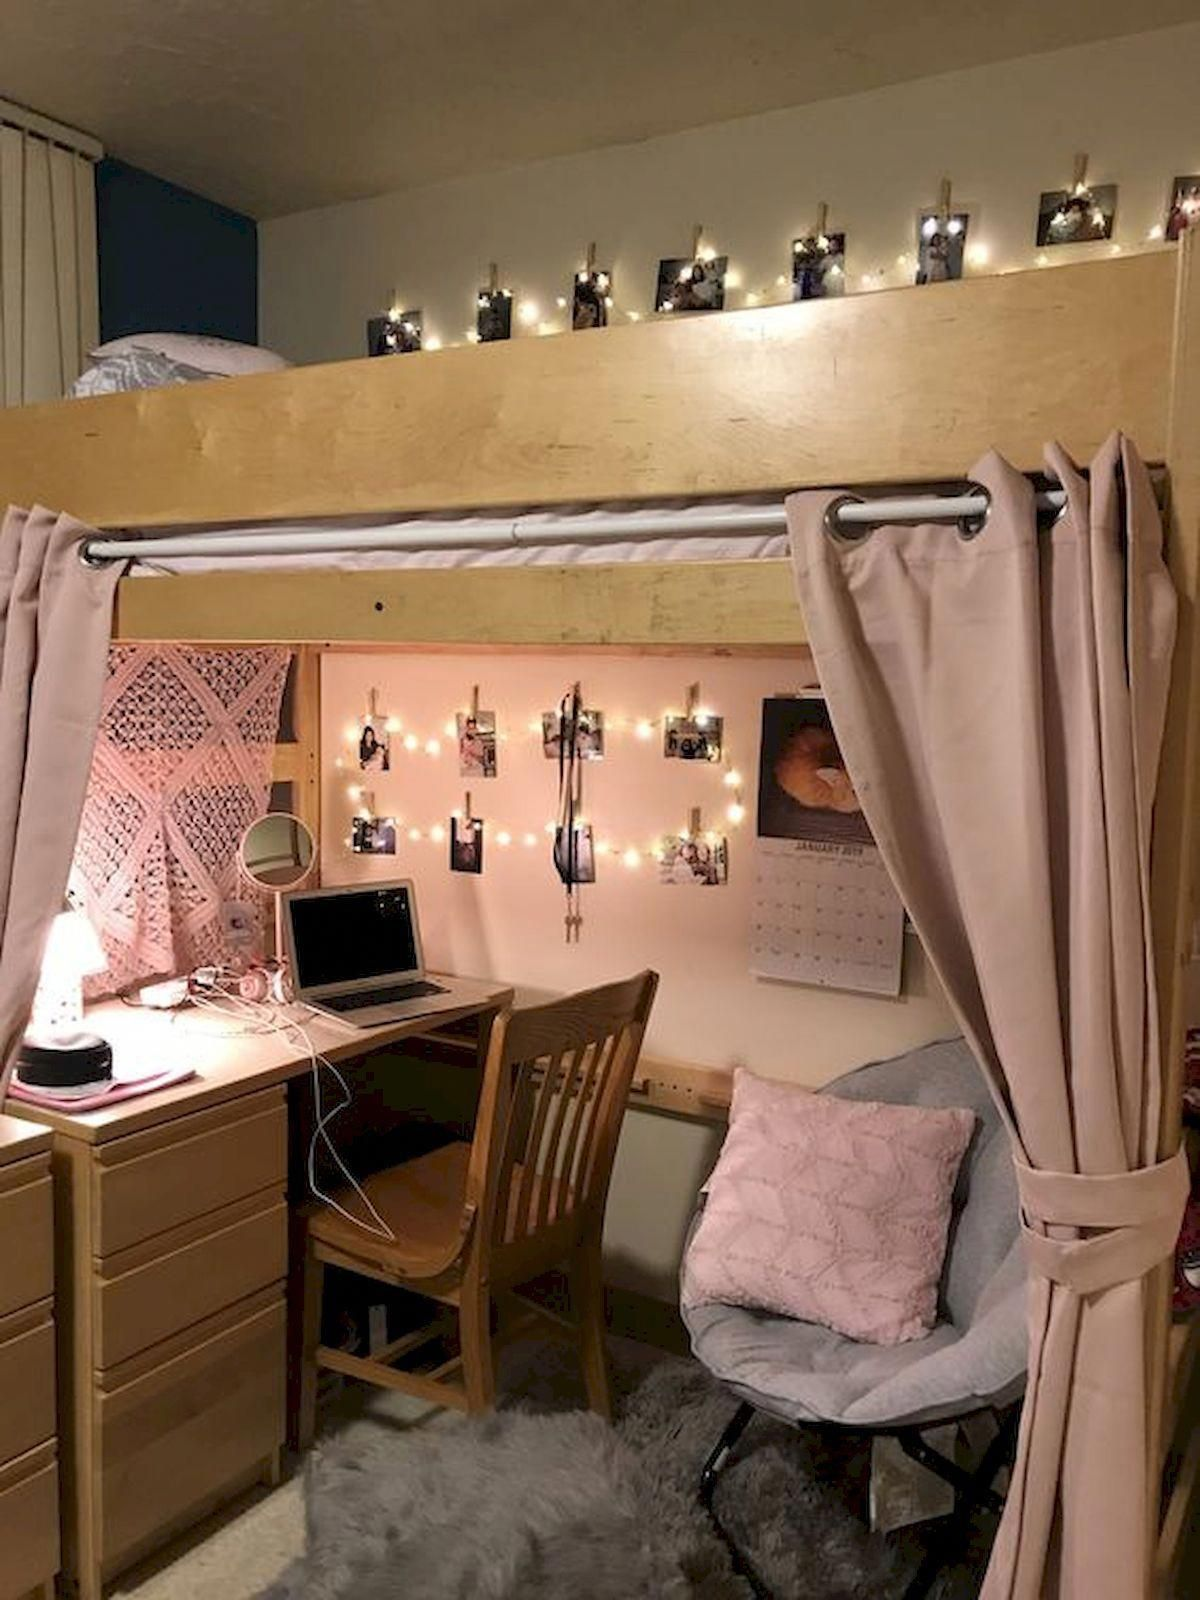 Interior Design Ideas Ideas To Decorate My Room Beds Ideas